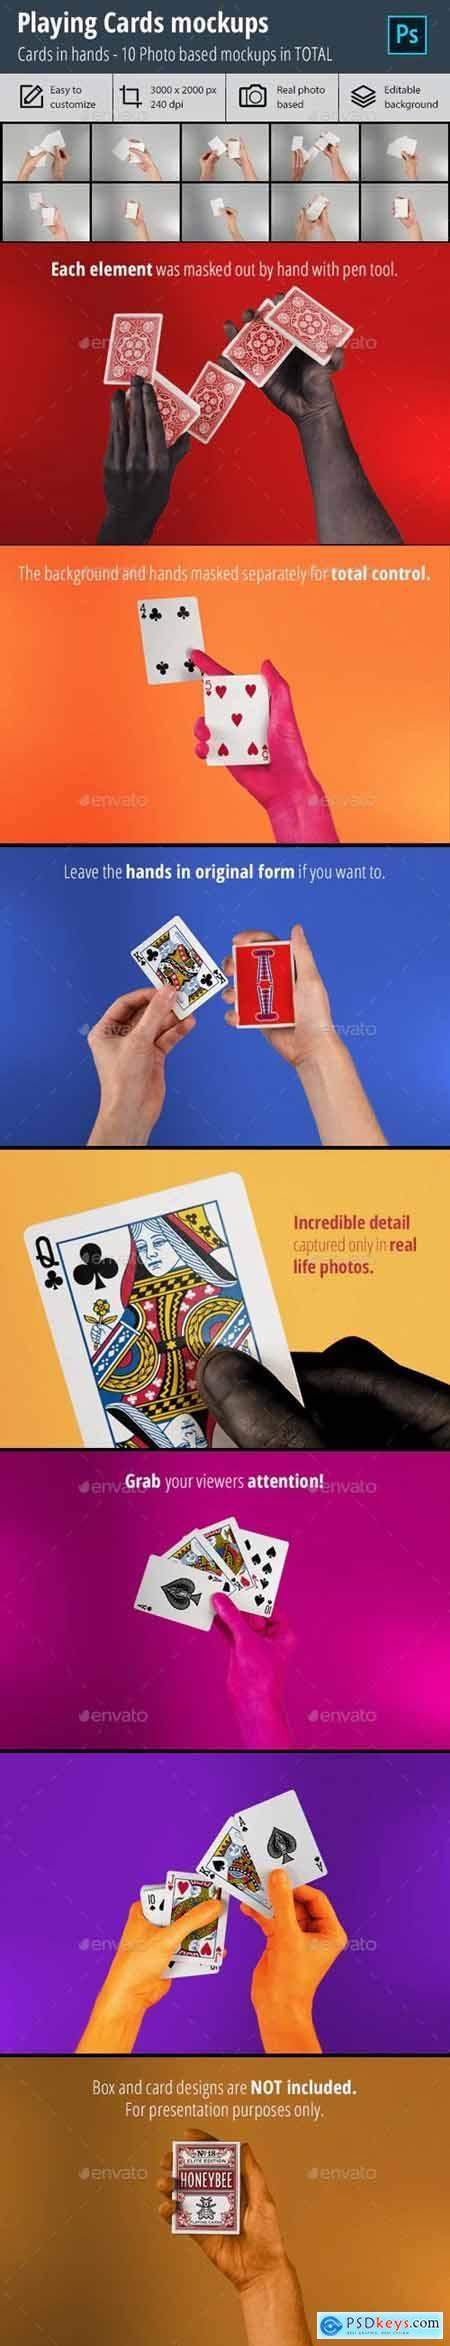 Playing Cards Mockup vol3 29401422